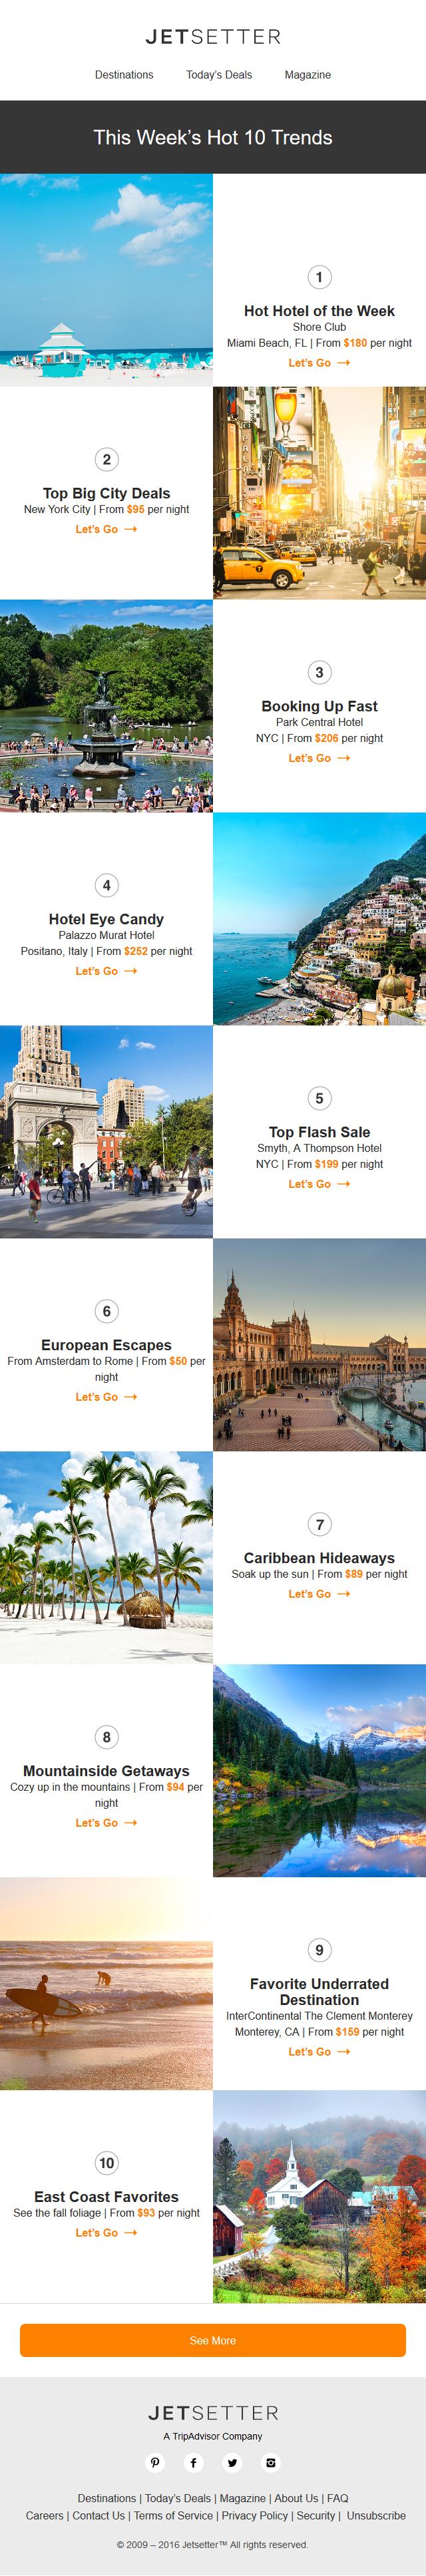 Trending Jetsetter - Now: Hot Miami Beach Hotels, Stylish City Sleeps, and Italian Eye Candy